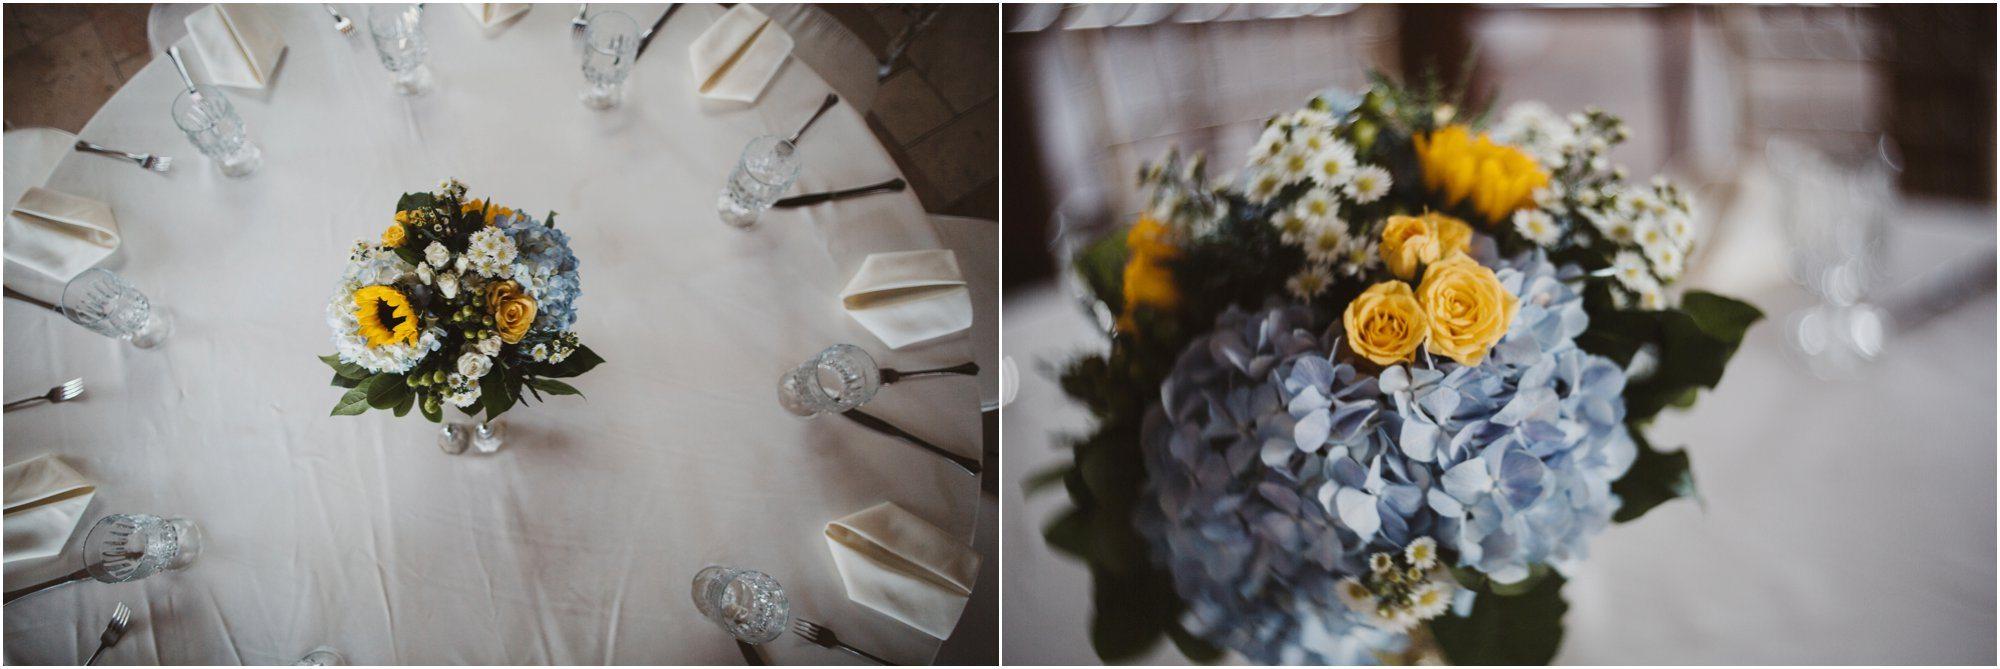 0062Top Santa Fe Wedding Photographer_Best Albuquerque Wedding Photographer_ Blue Rose Photography_ La Fonda Wedding Pictures